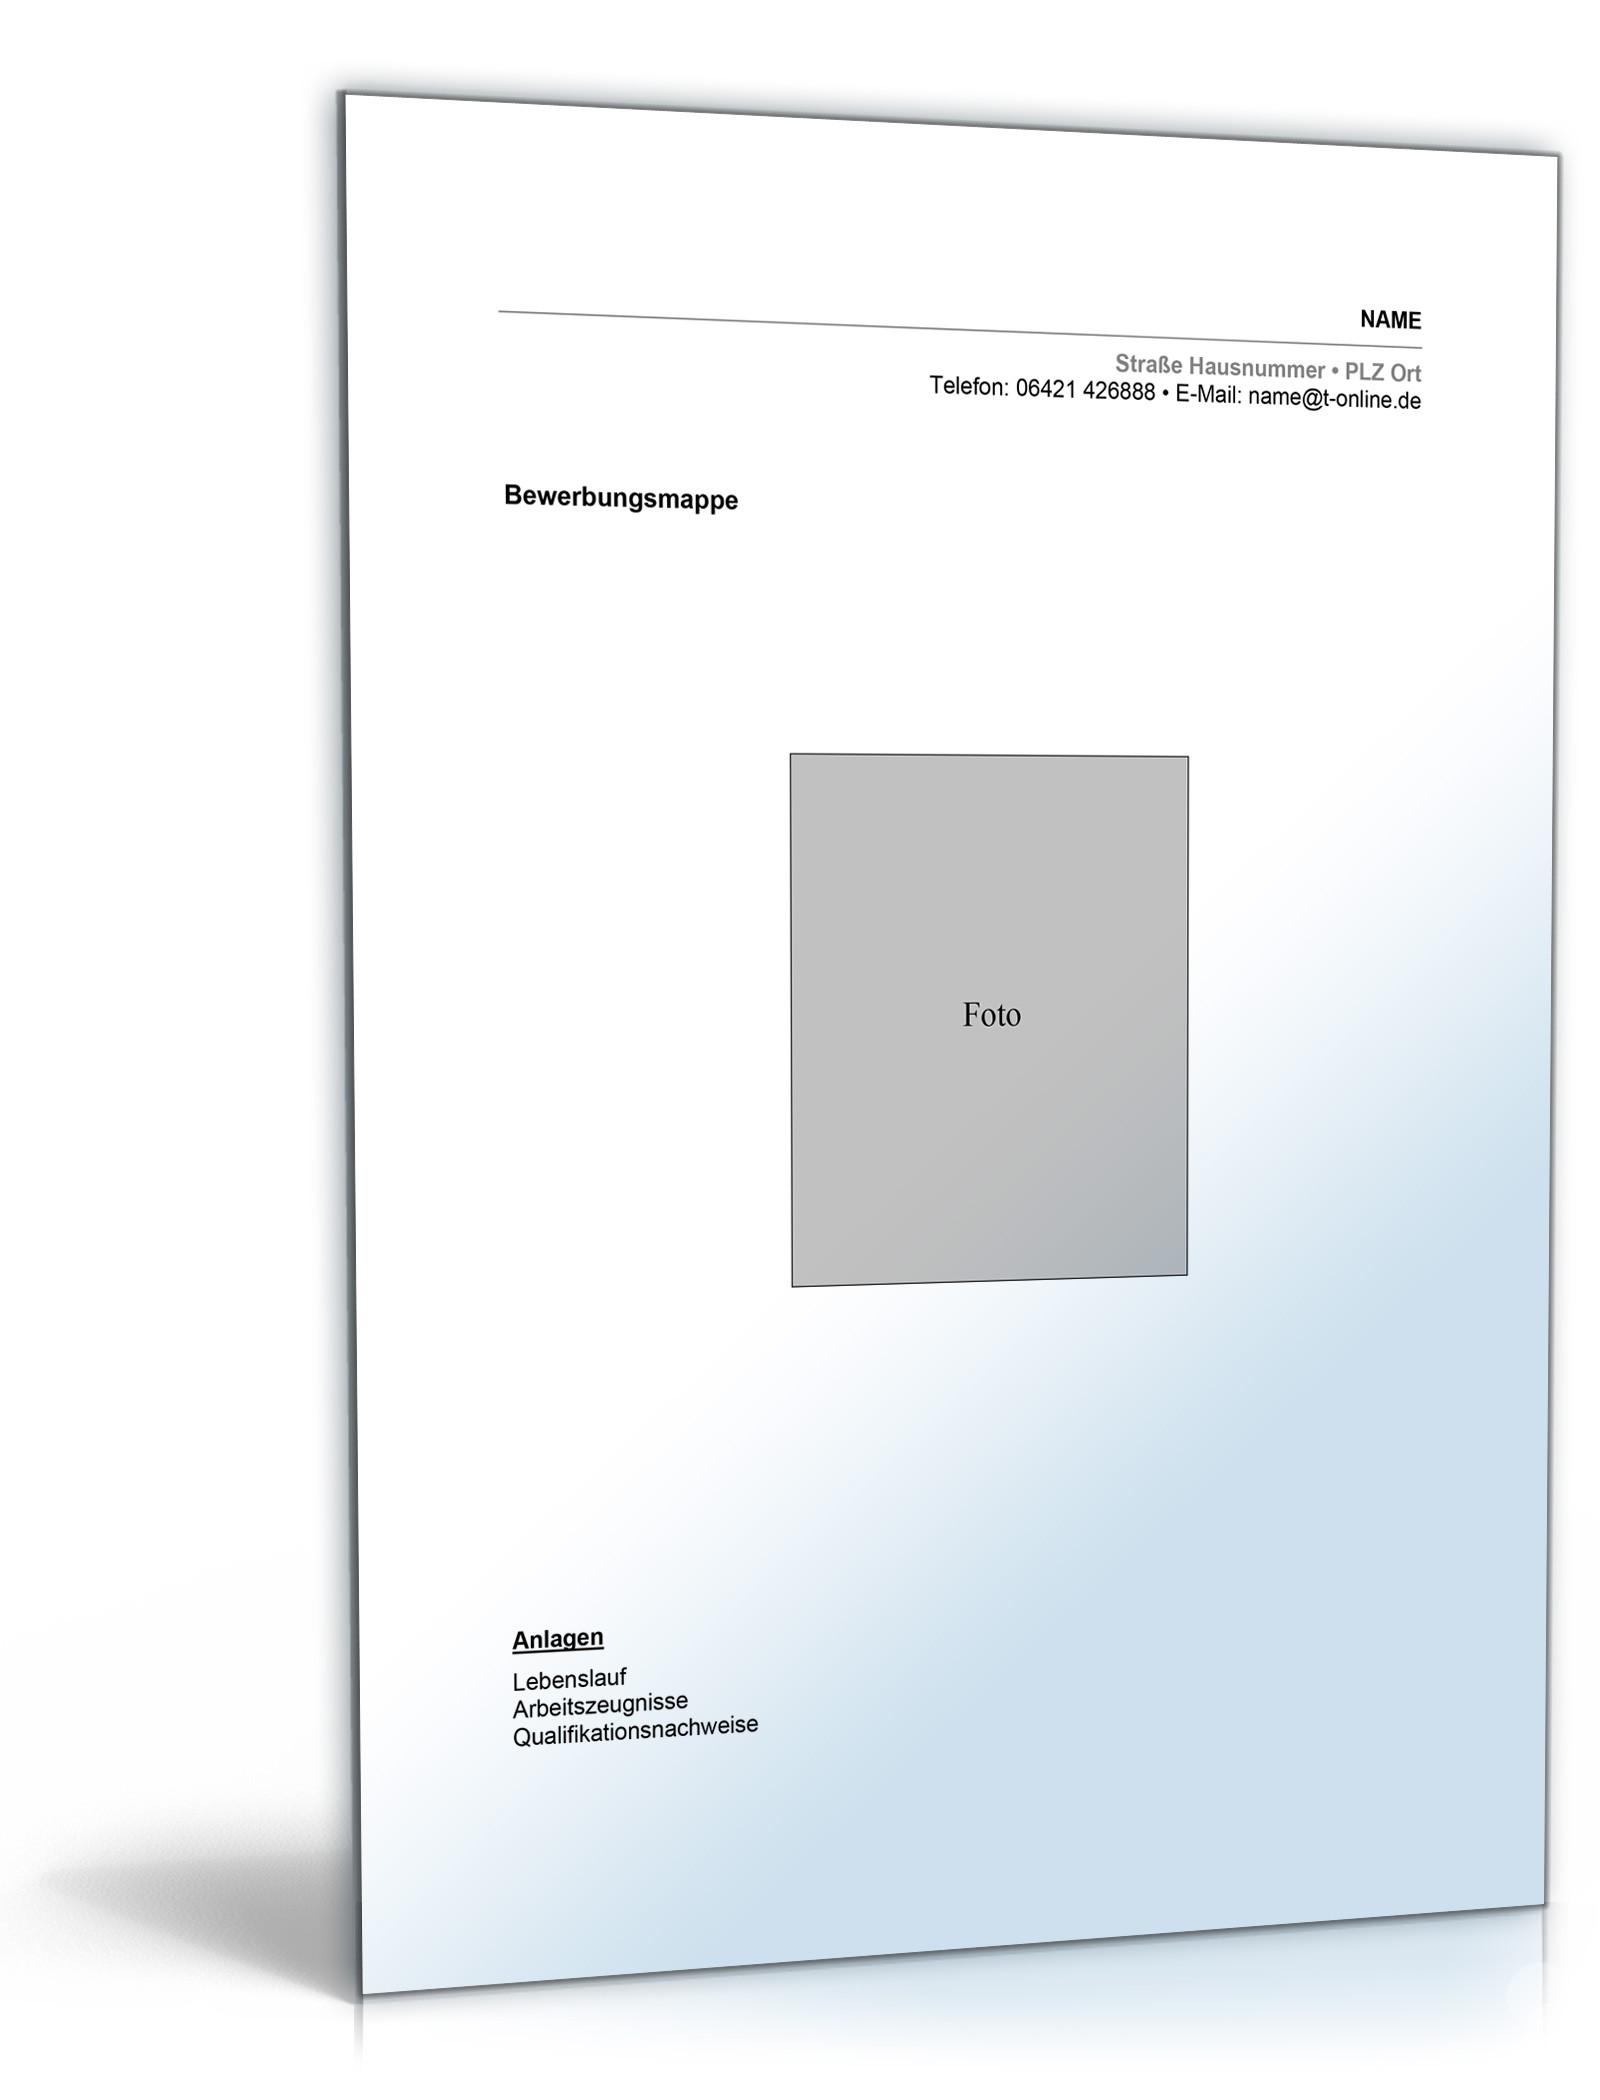 Lebenslauf Feinwerkmechaniker Muster Zum Download